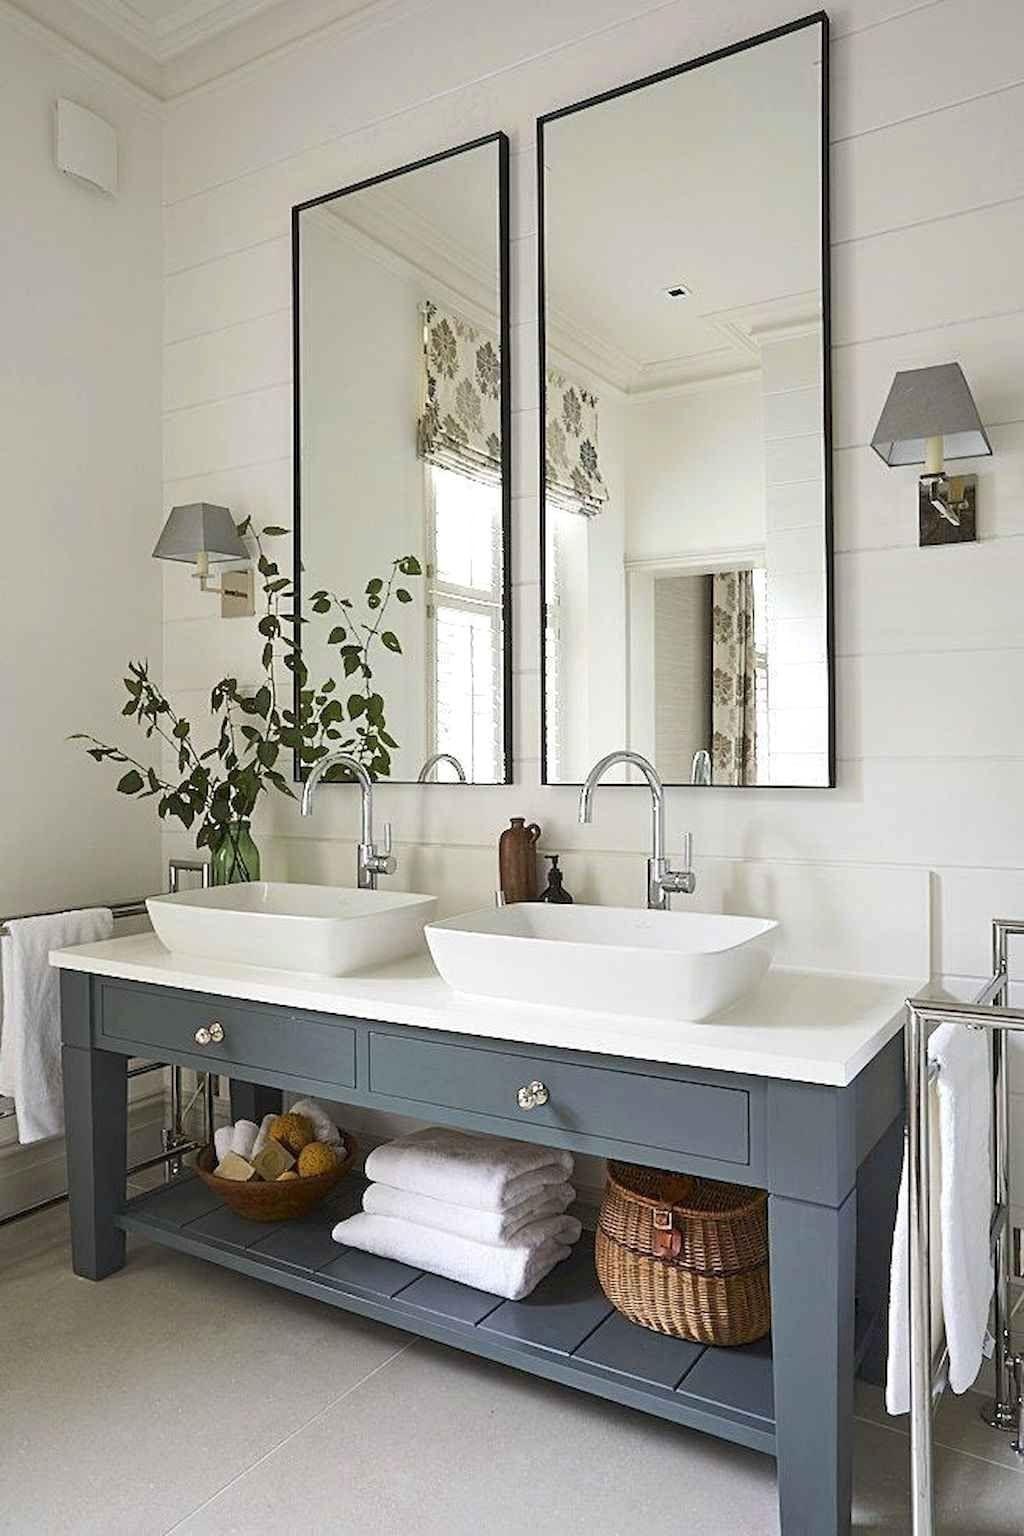 Photo of Wonderful bathroom decorating ideas